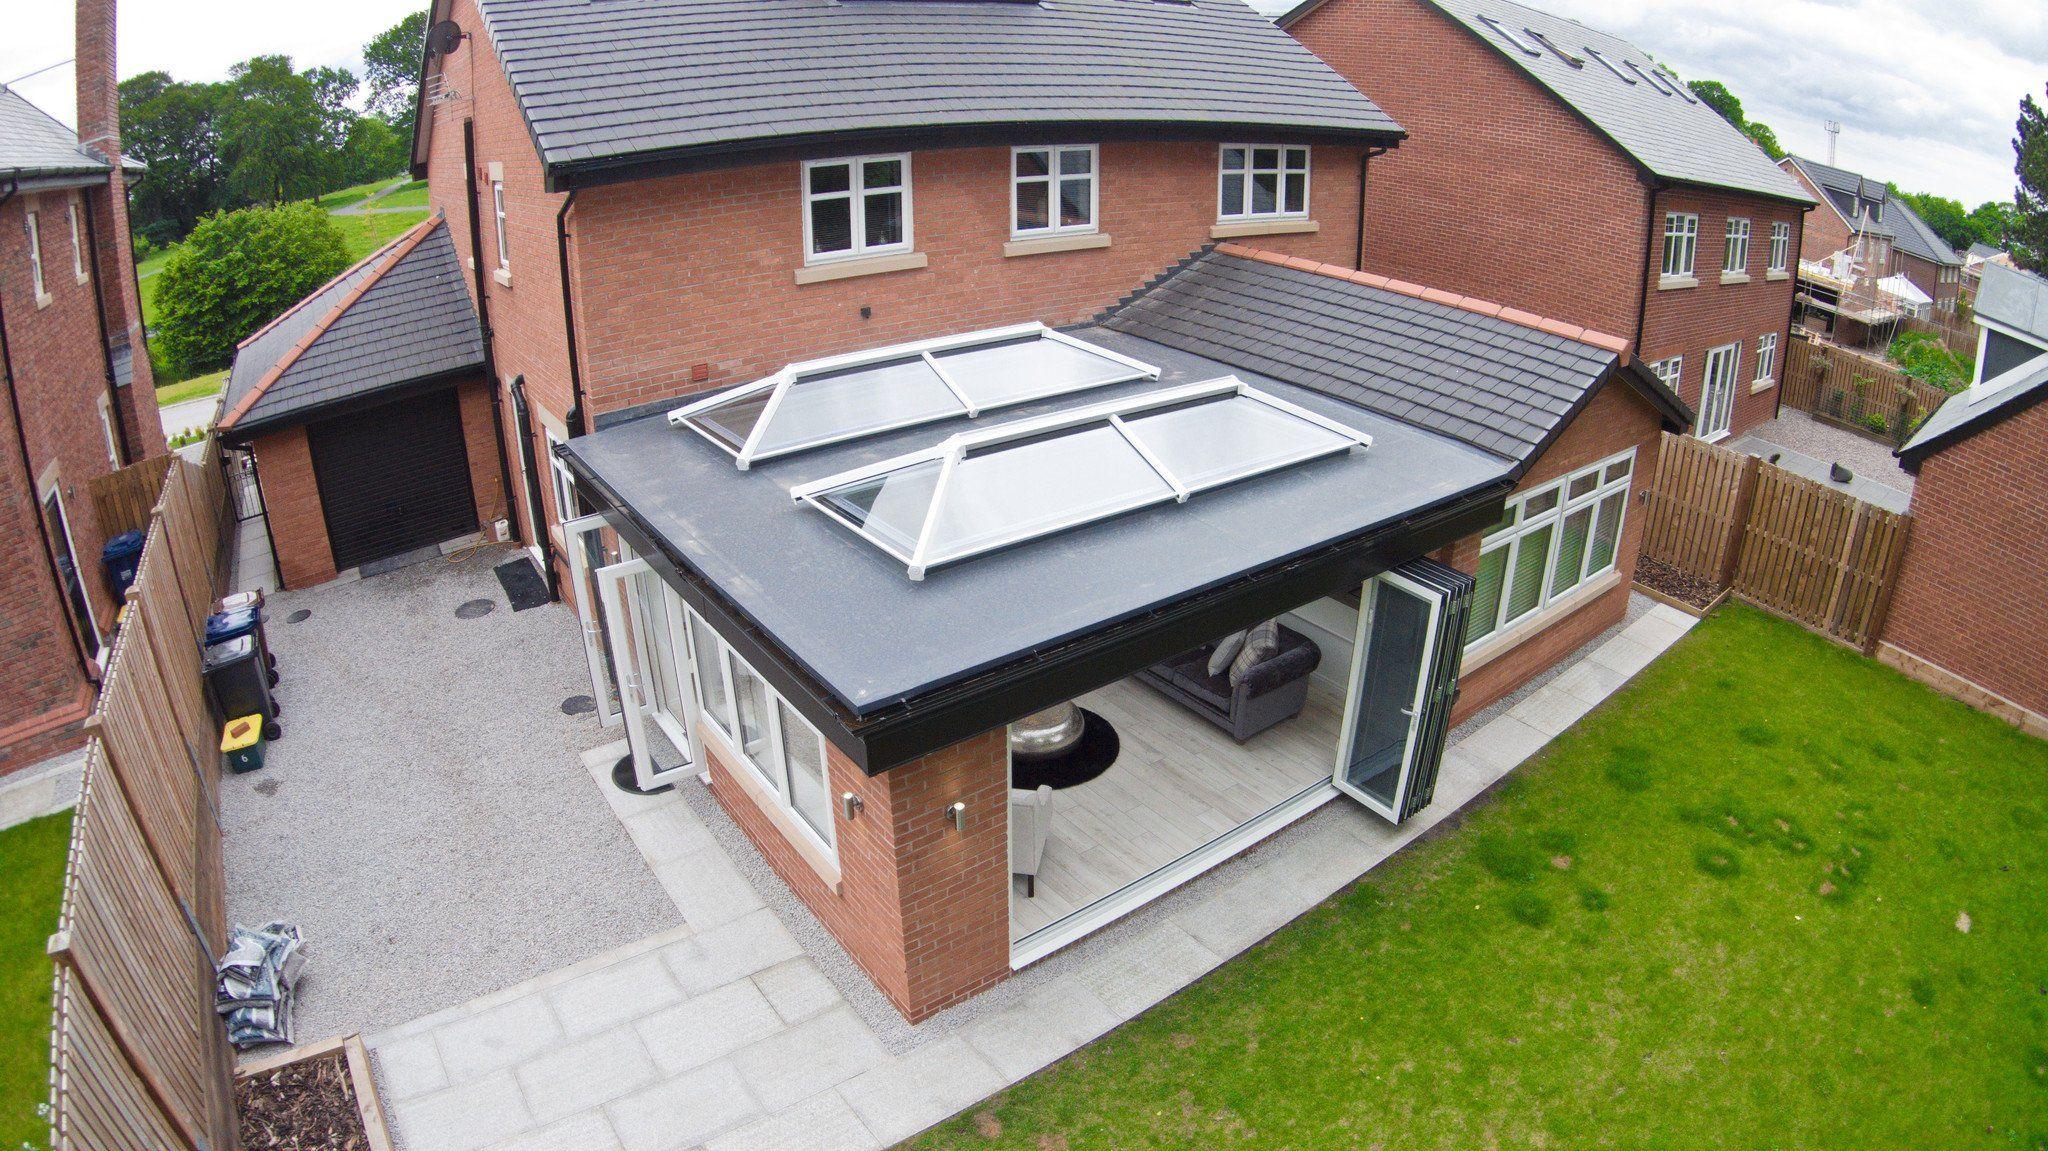 2500 X 1500 Aluminium Lantern Roof Ultrasky Unglazed In 2020 Roof Lantern Flat Roof Extension House Extensions